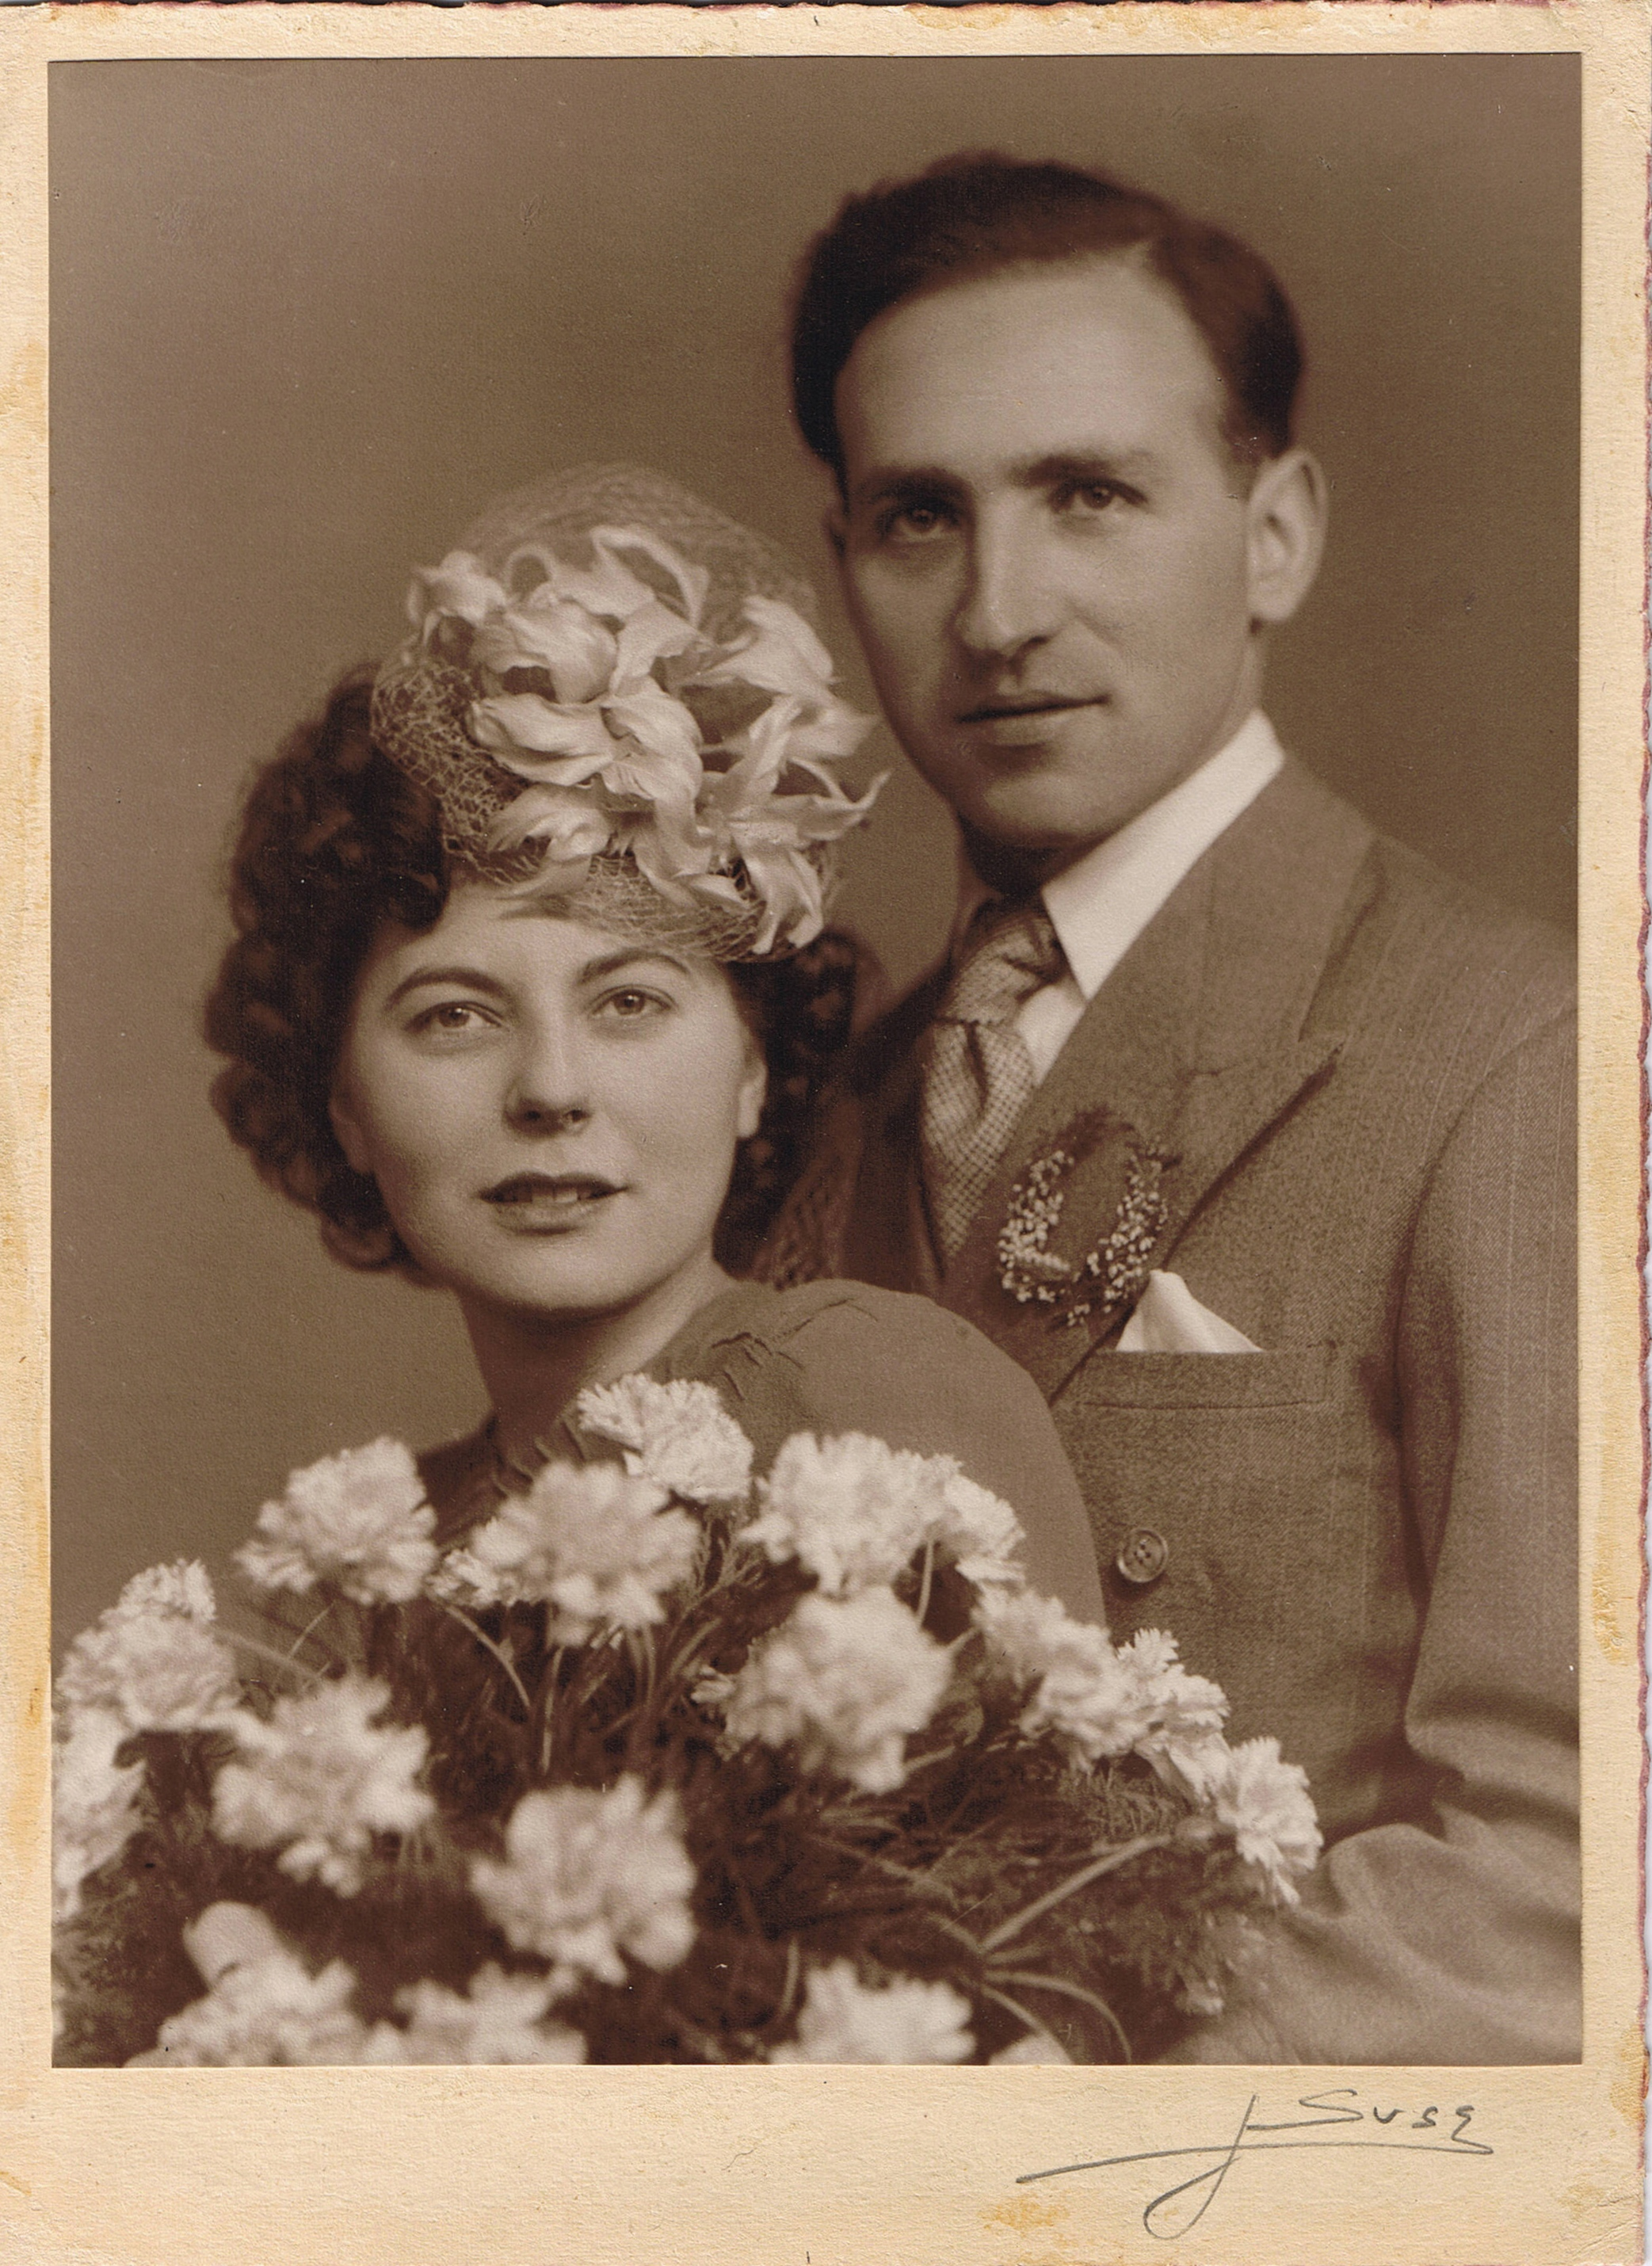 Wedding day, 8 January 1947